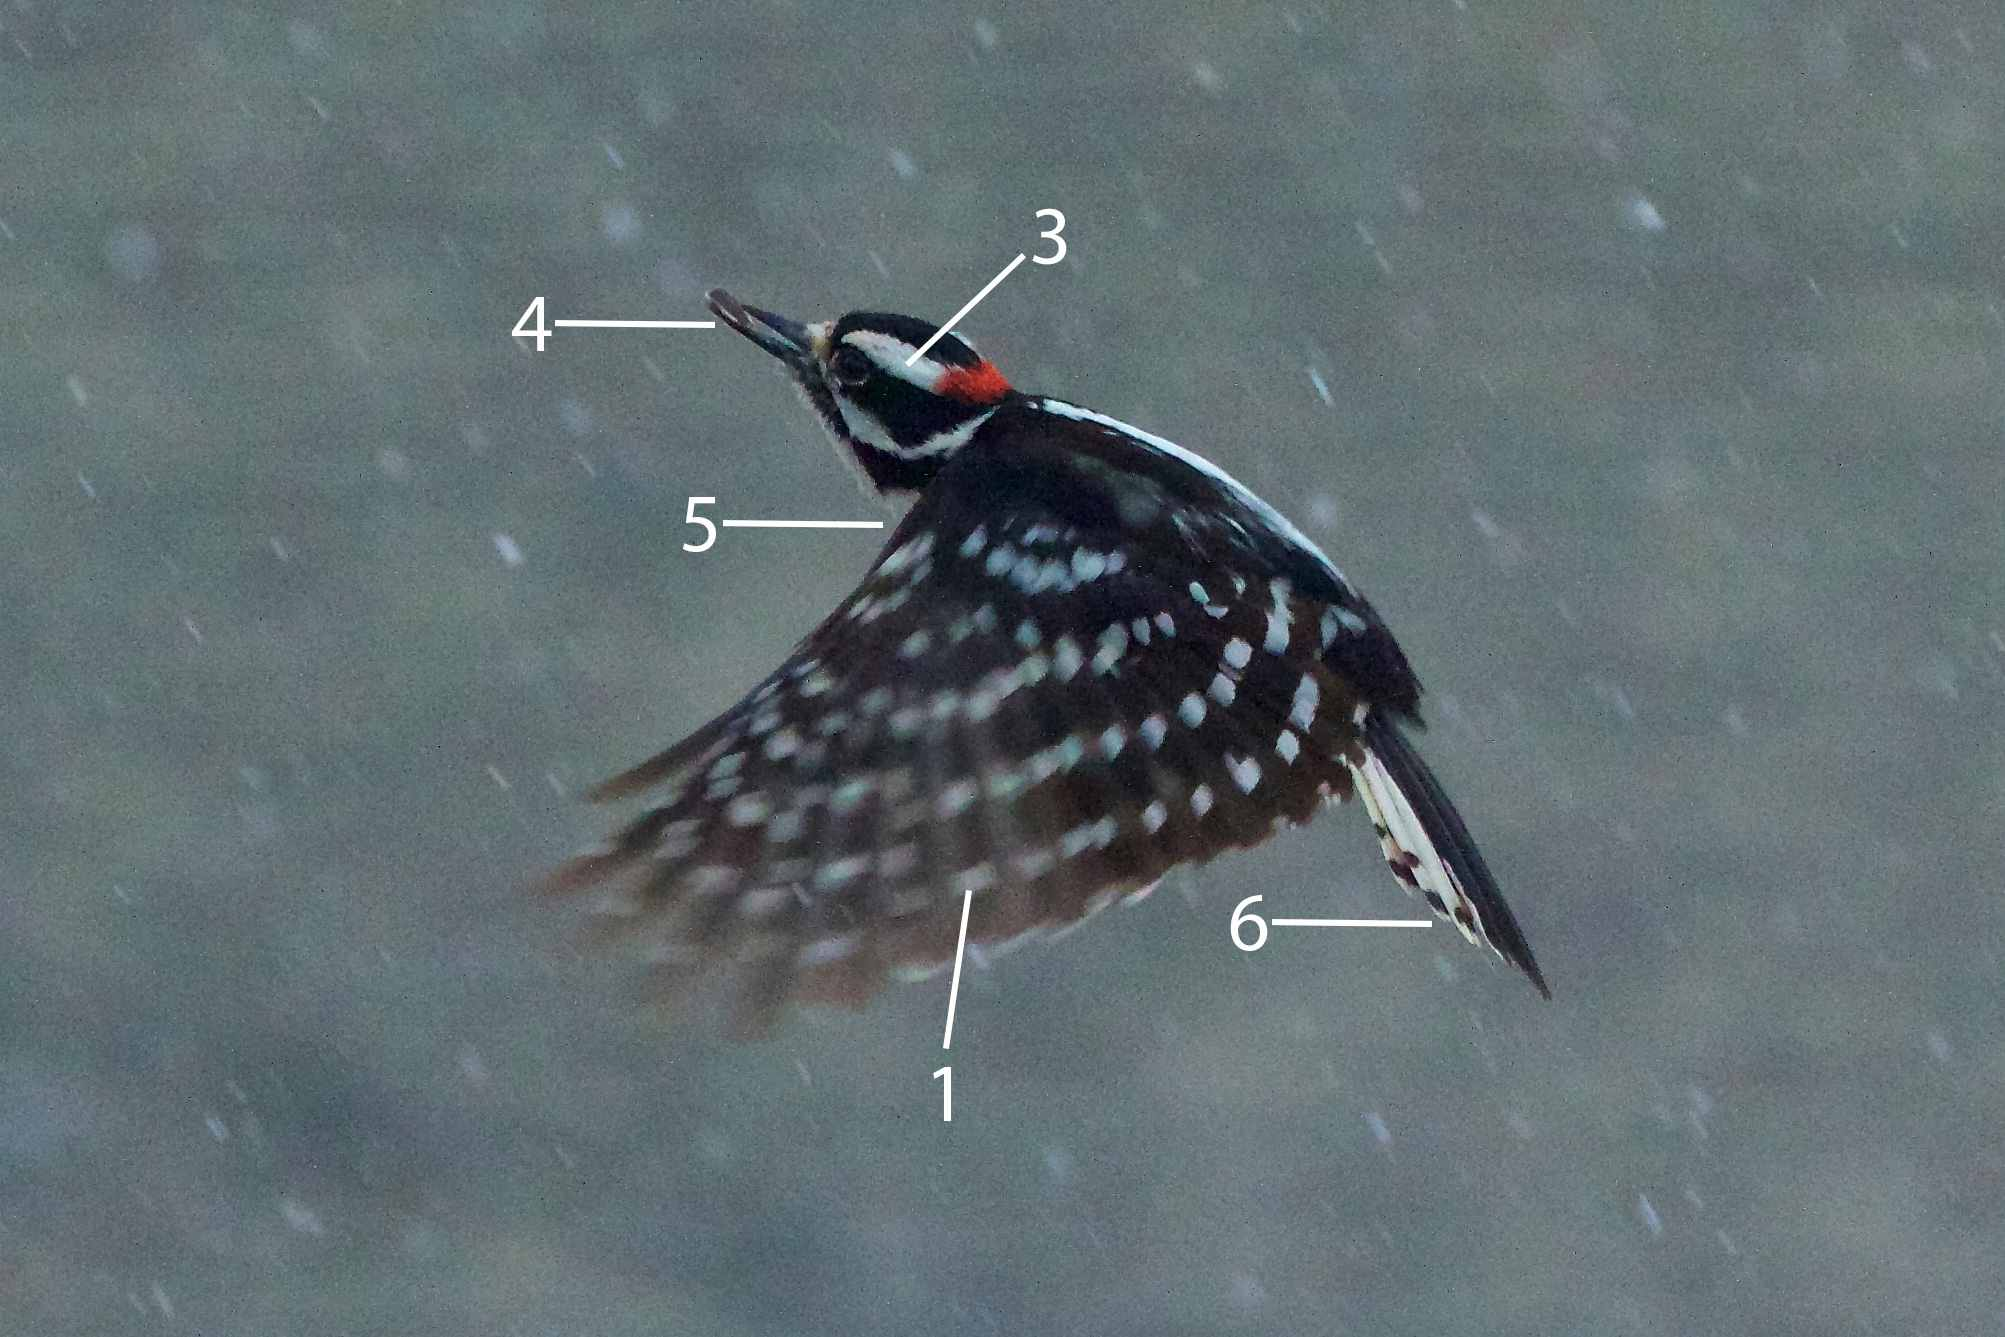 Pájaro carpintero suave en vuelo